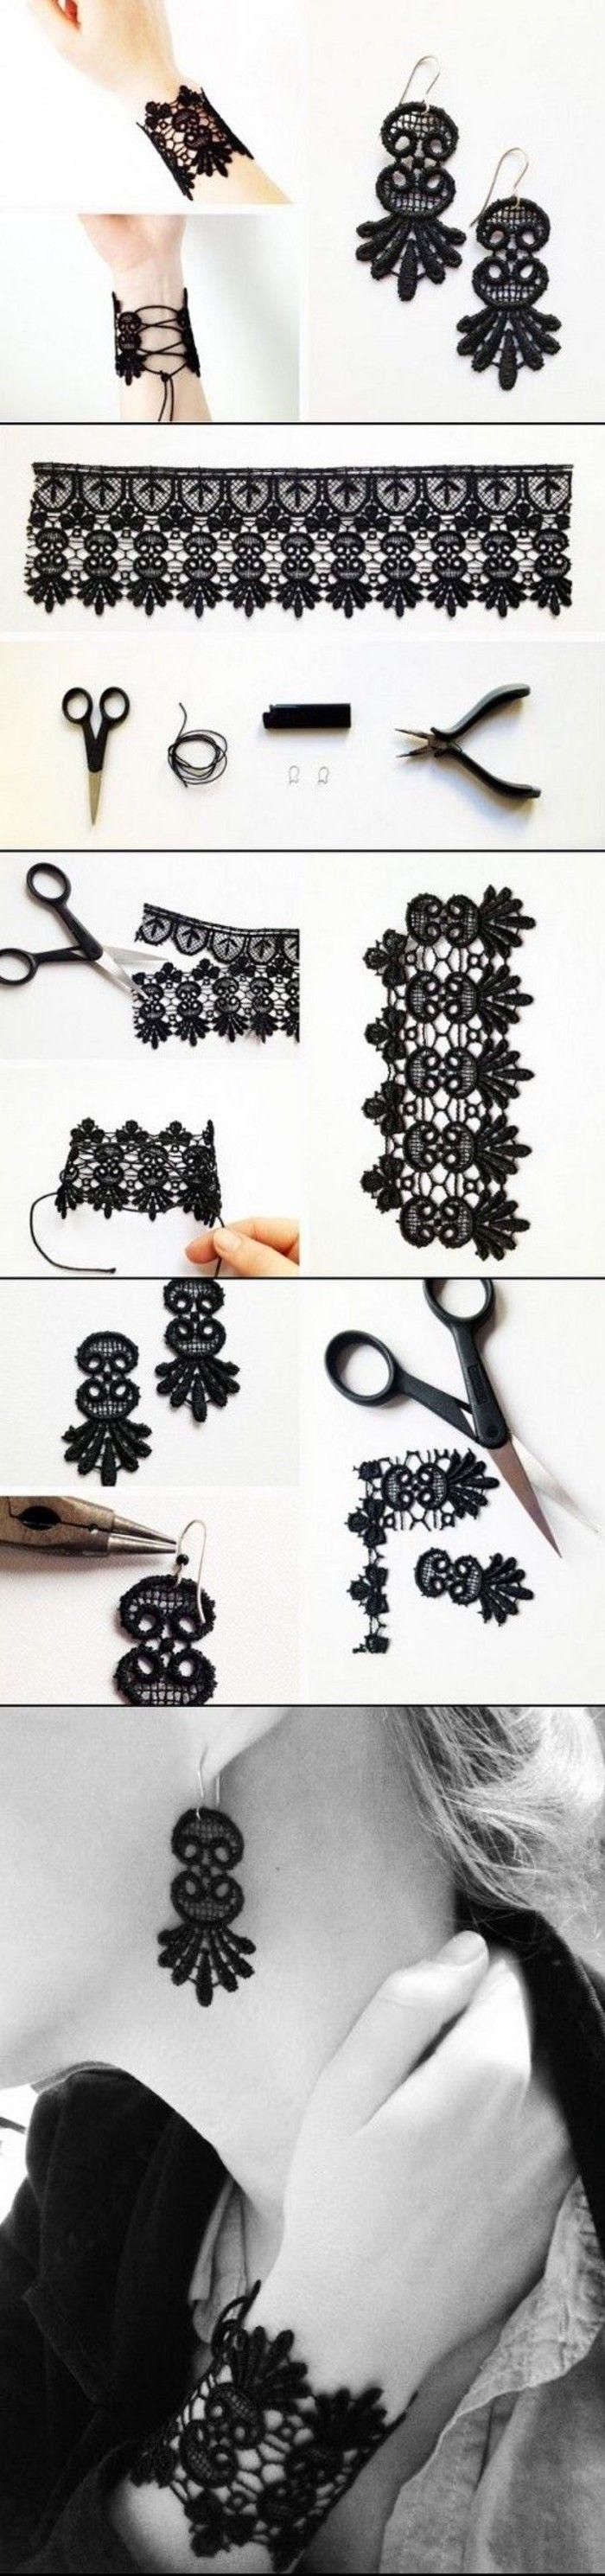 DIY Fashion Lace Jewelry